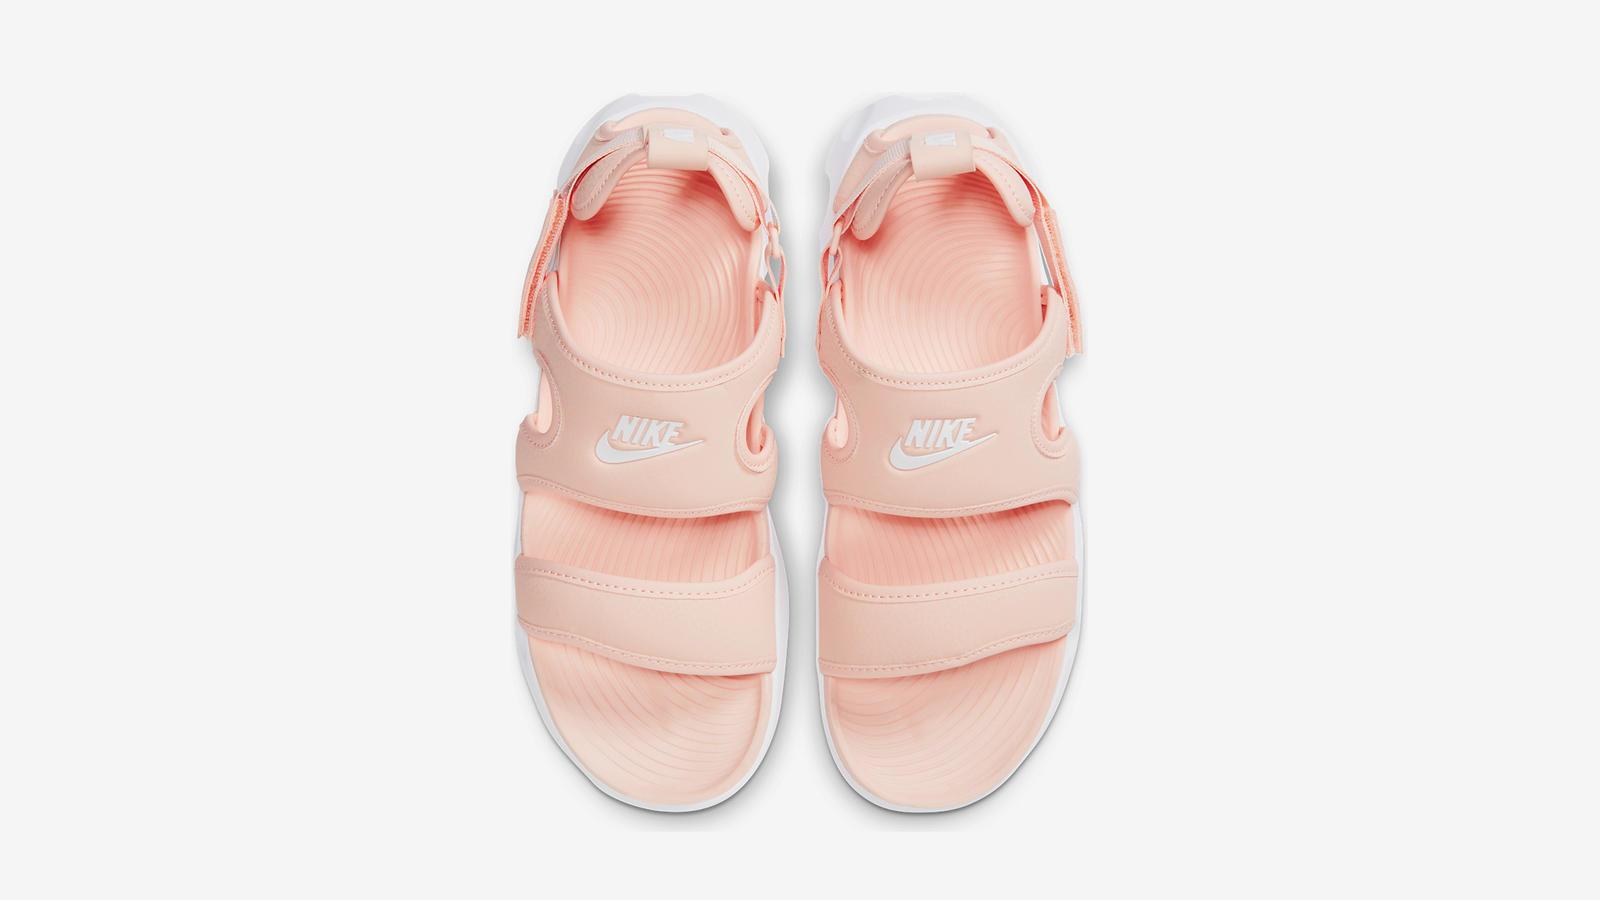 Nike Sportswear Summer 2020 Sandals Nike Canyon Nike Asuna Nike Owaysis 10